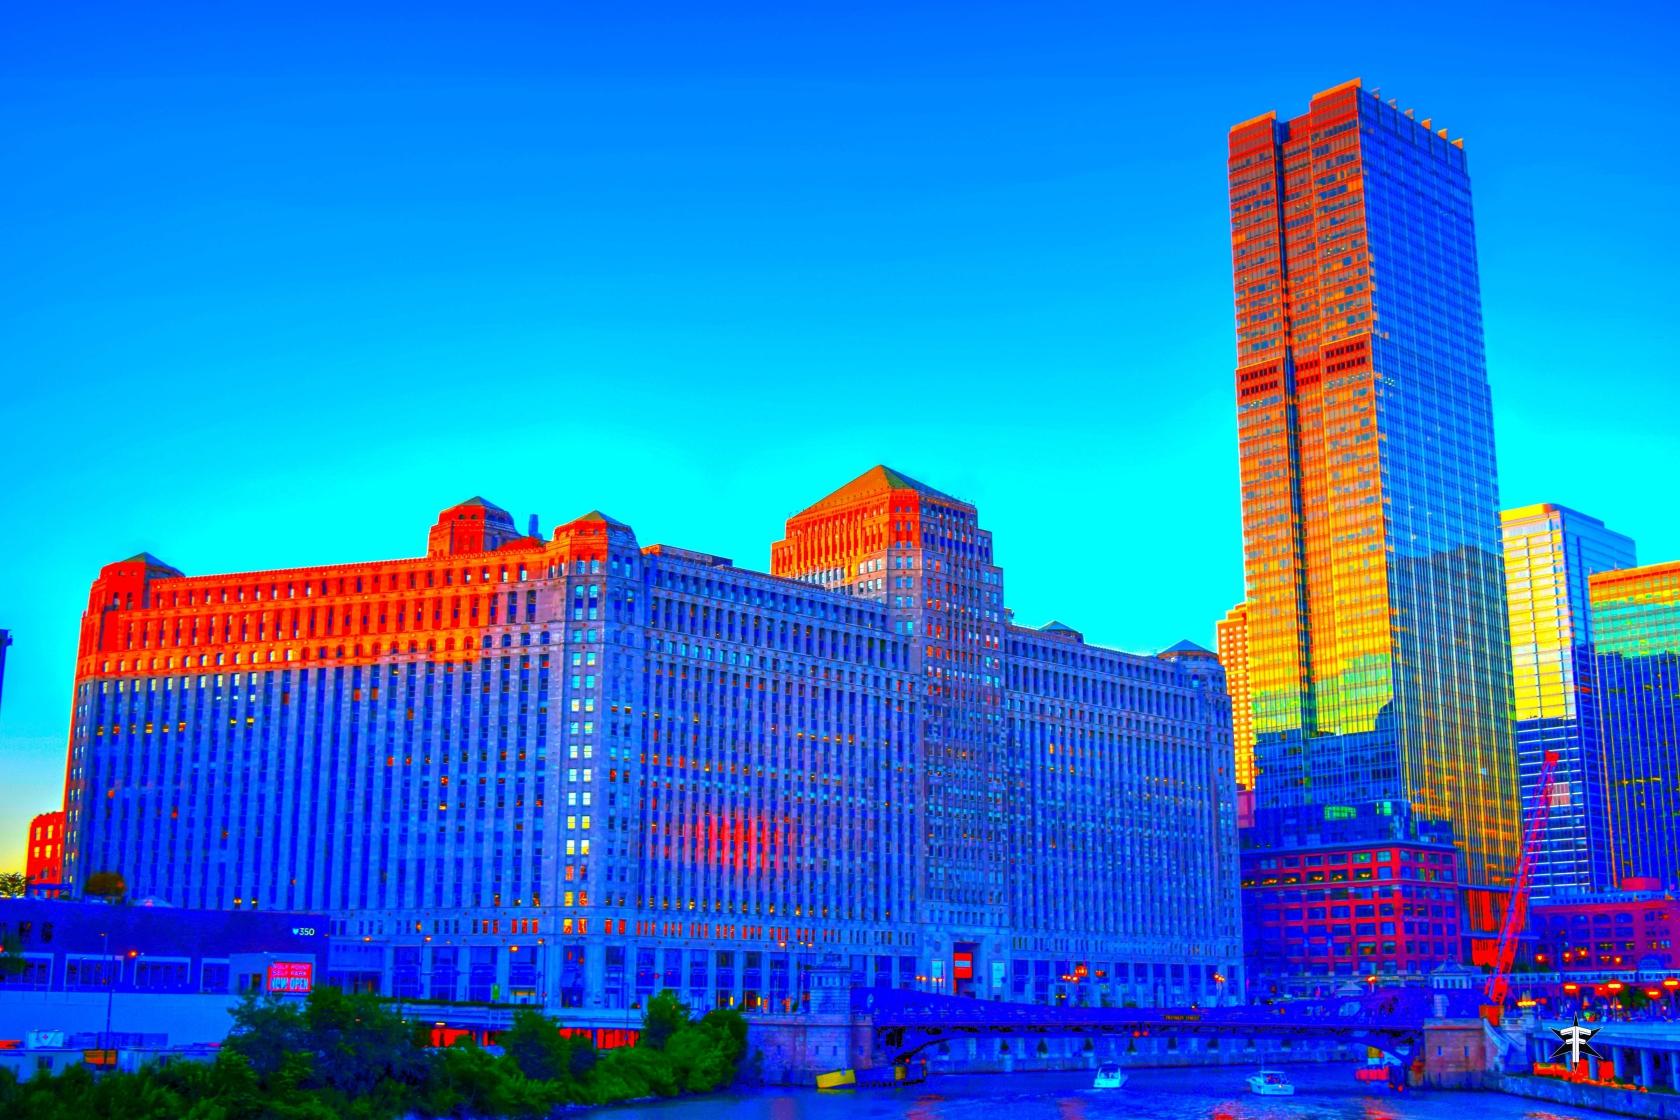 batch_merchandisemart chicago colorful rainbow sunset.jpg